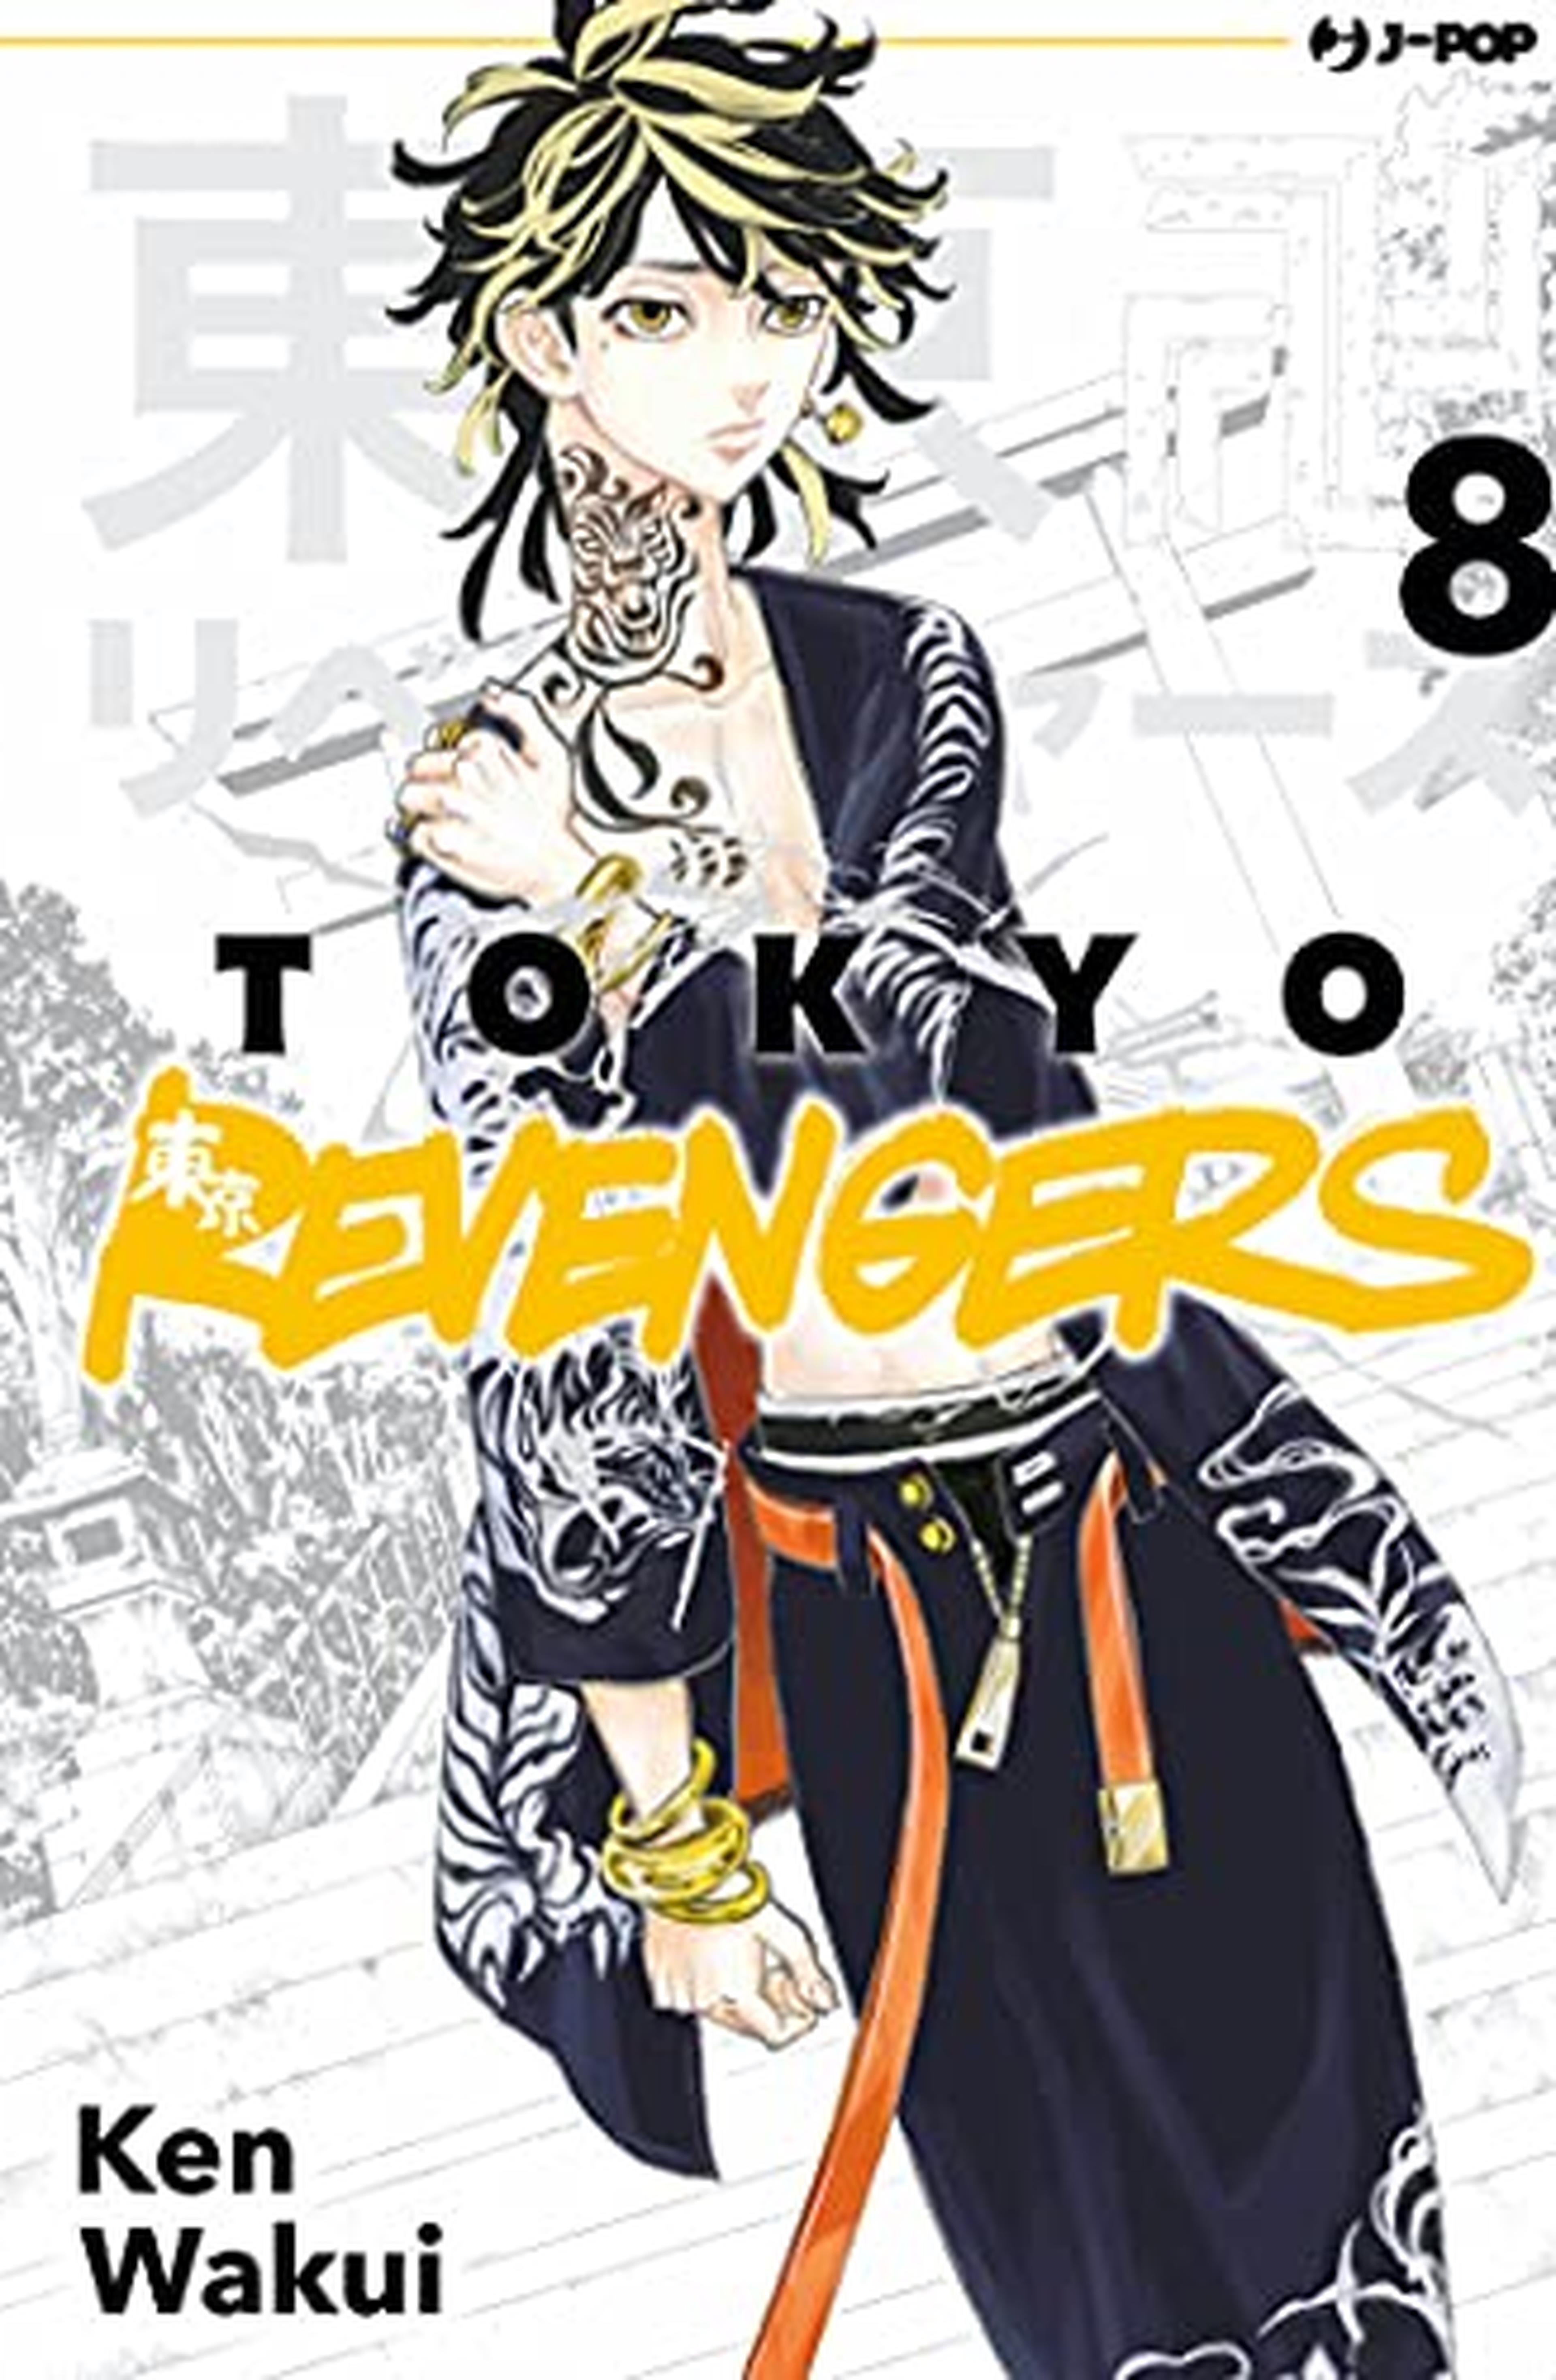 Tokyo revengers (Vol. 8)